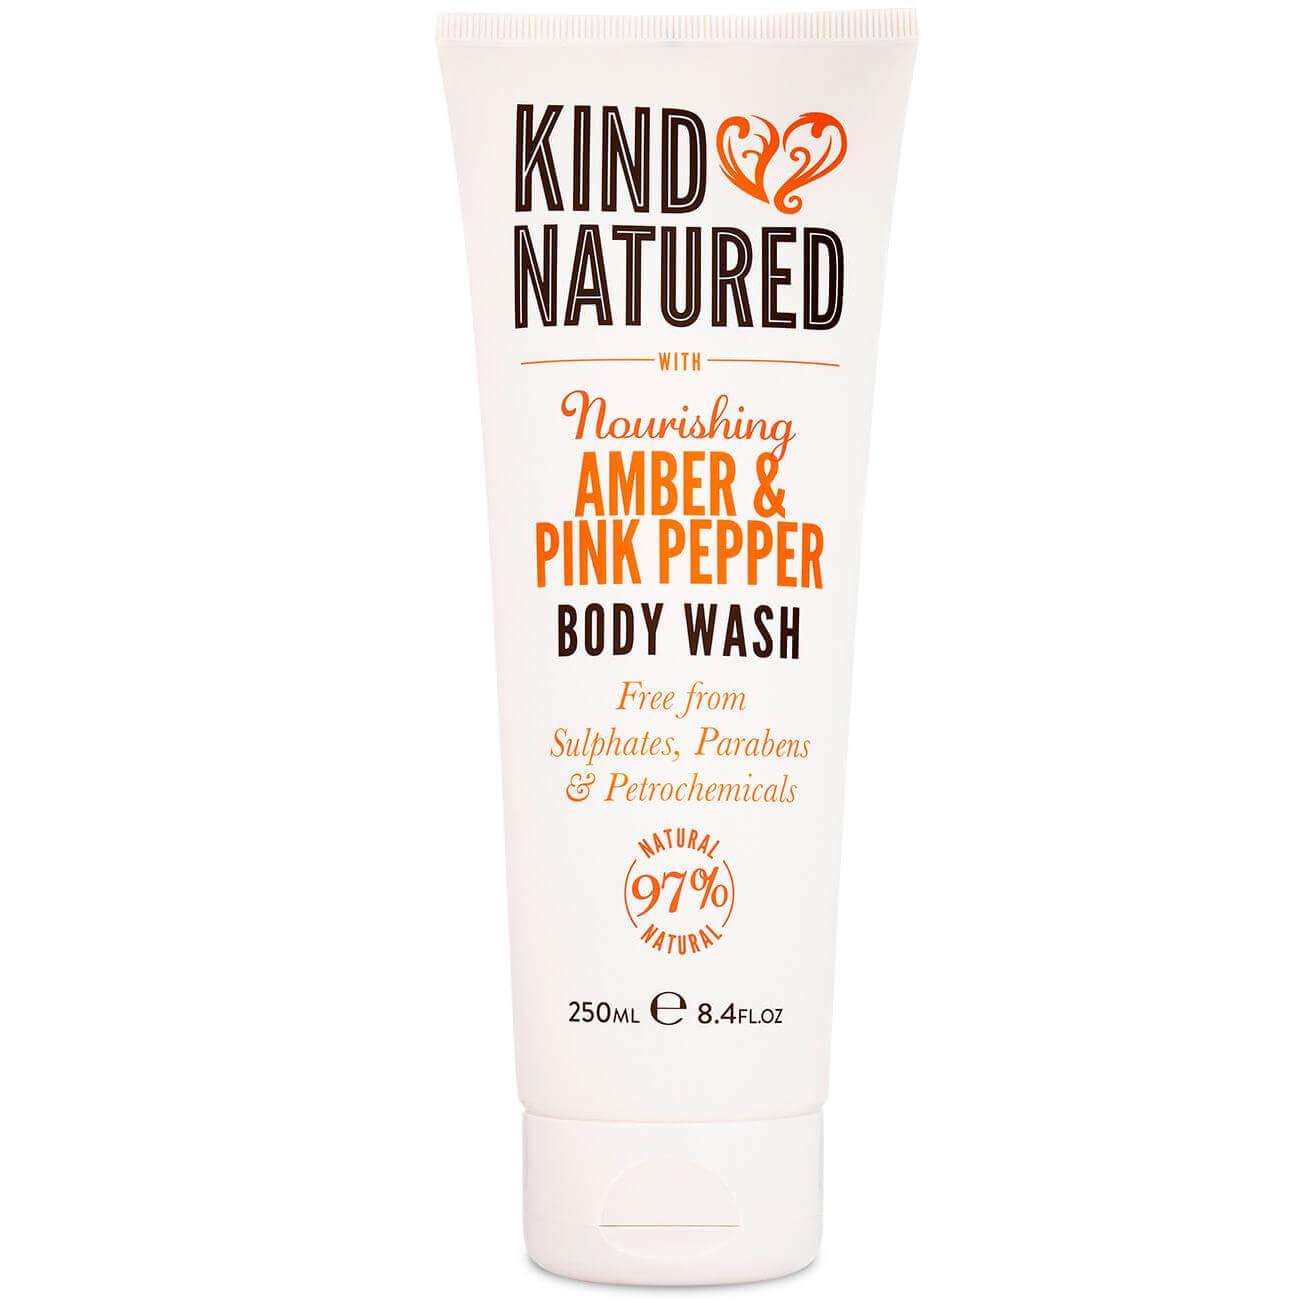 Kind Natured Nourishing Body Wash Amber & Pink Pepper Αφρόλουτρομε Κεχριμπάρι & υγιεινή   σώμα   αφρόλουτρα creme douche